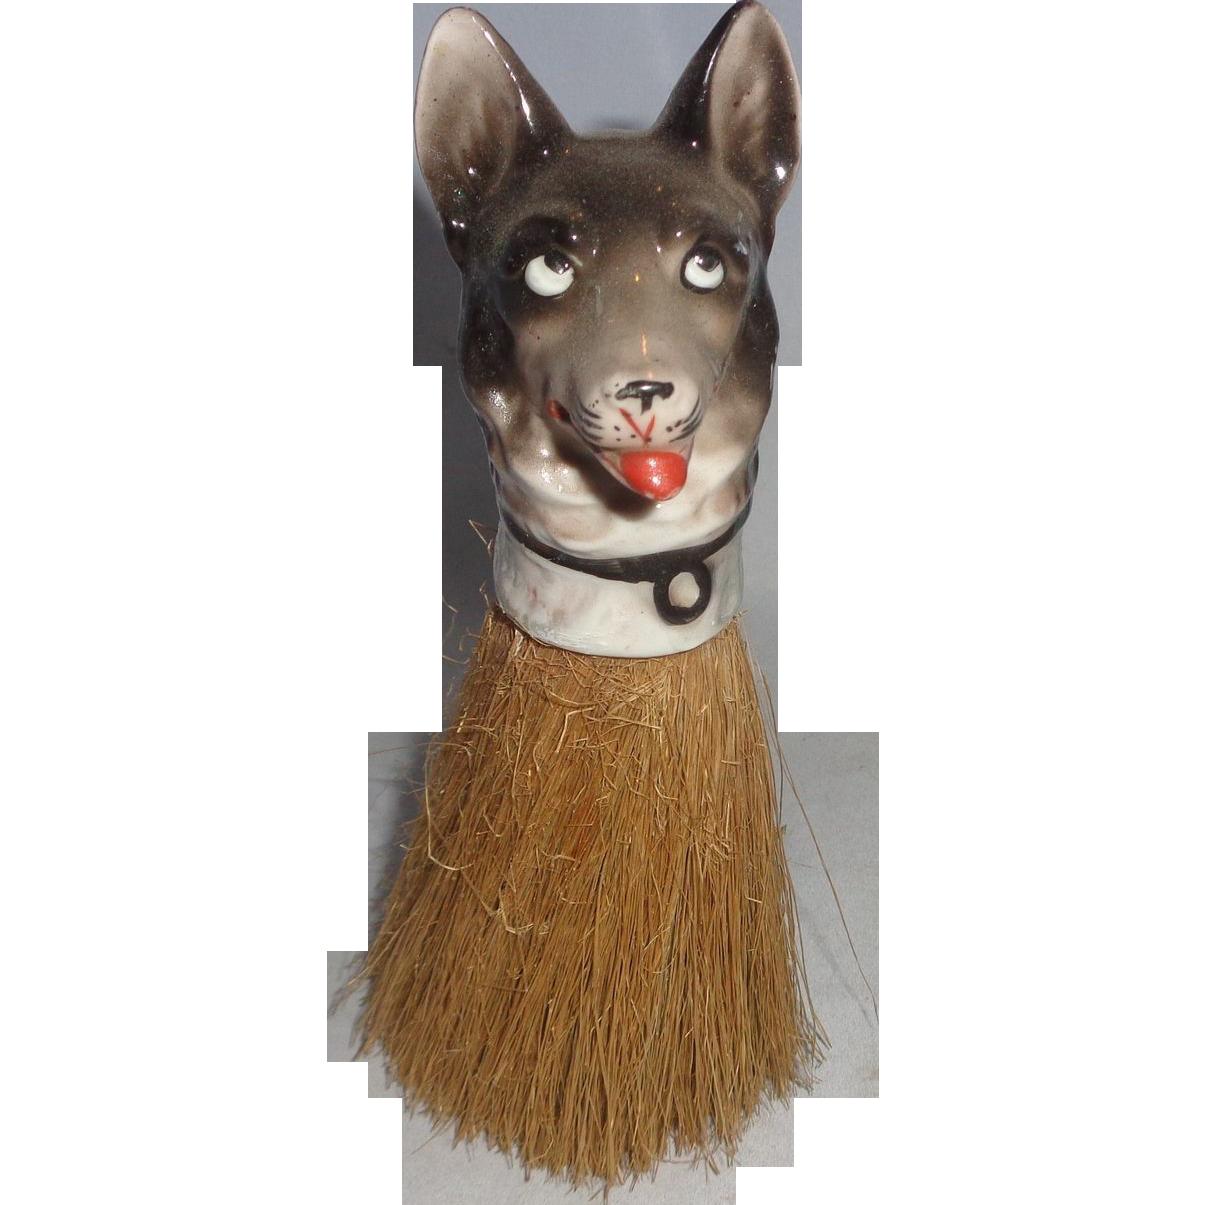 Vintage German Shepherd Whisk Brush, Adorable